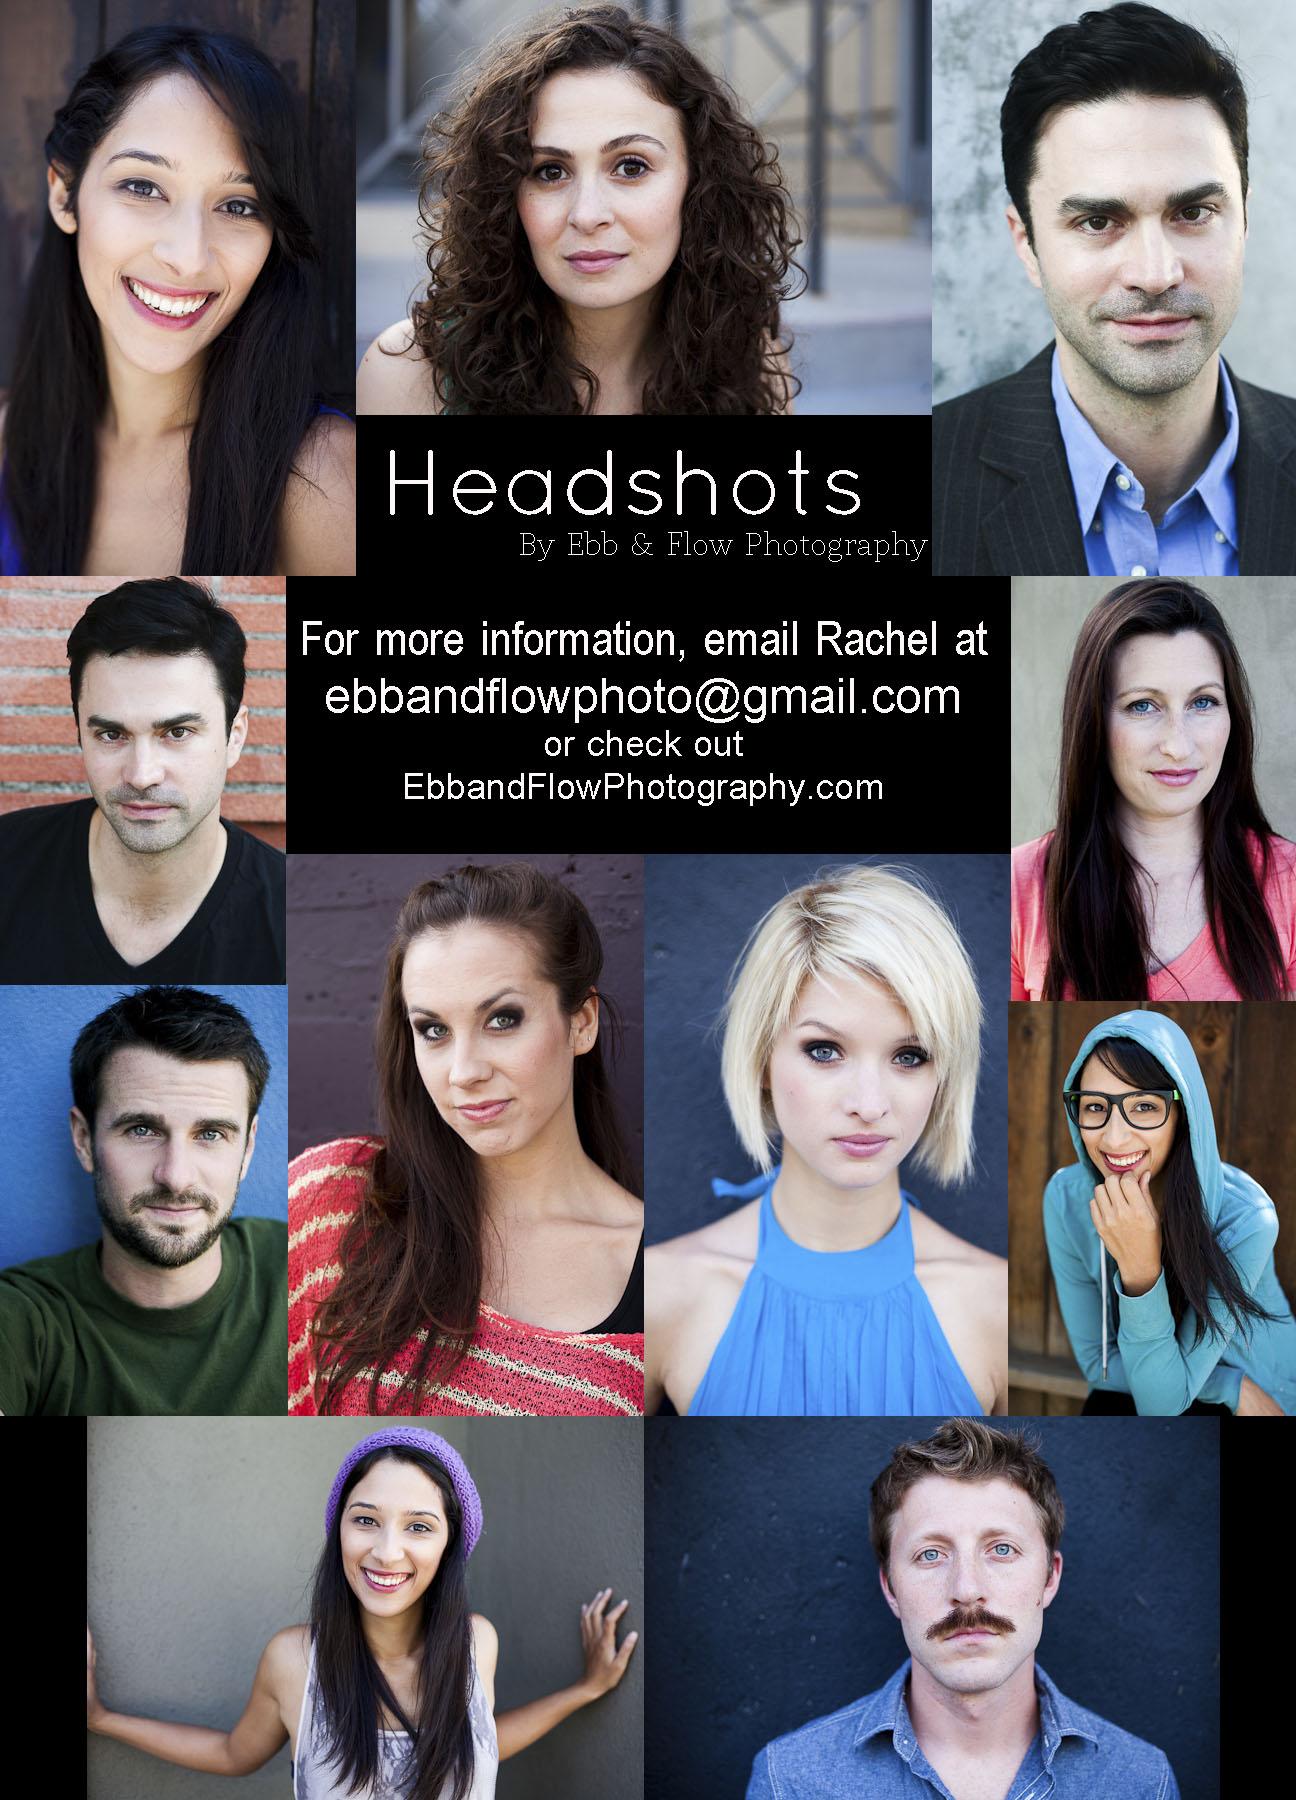 Headshots+by+Ebb+&+Flow+Photography.jpg